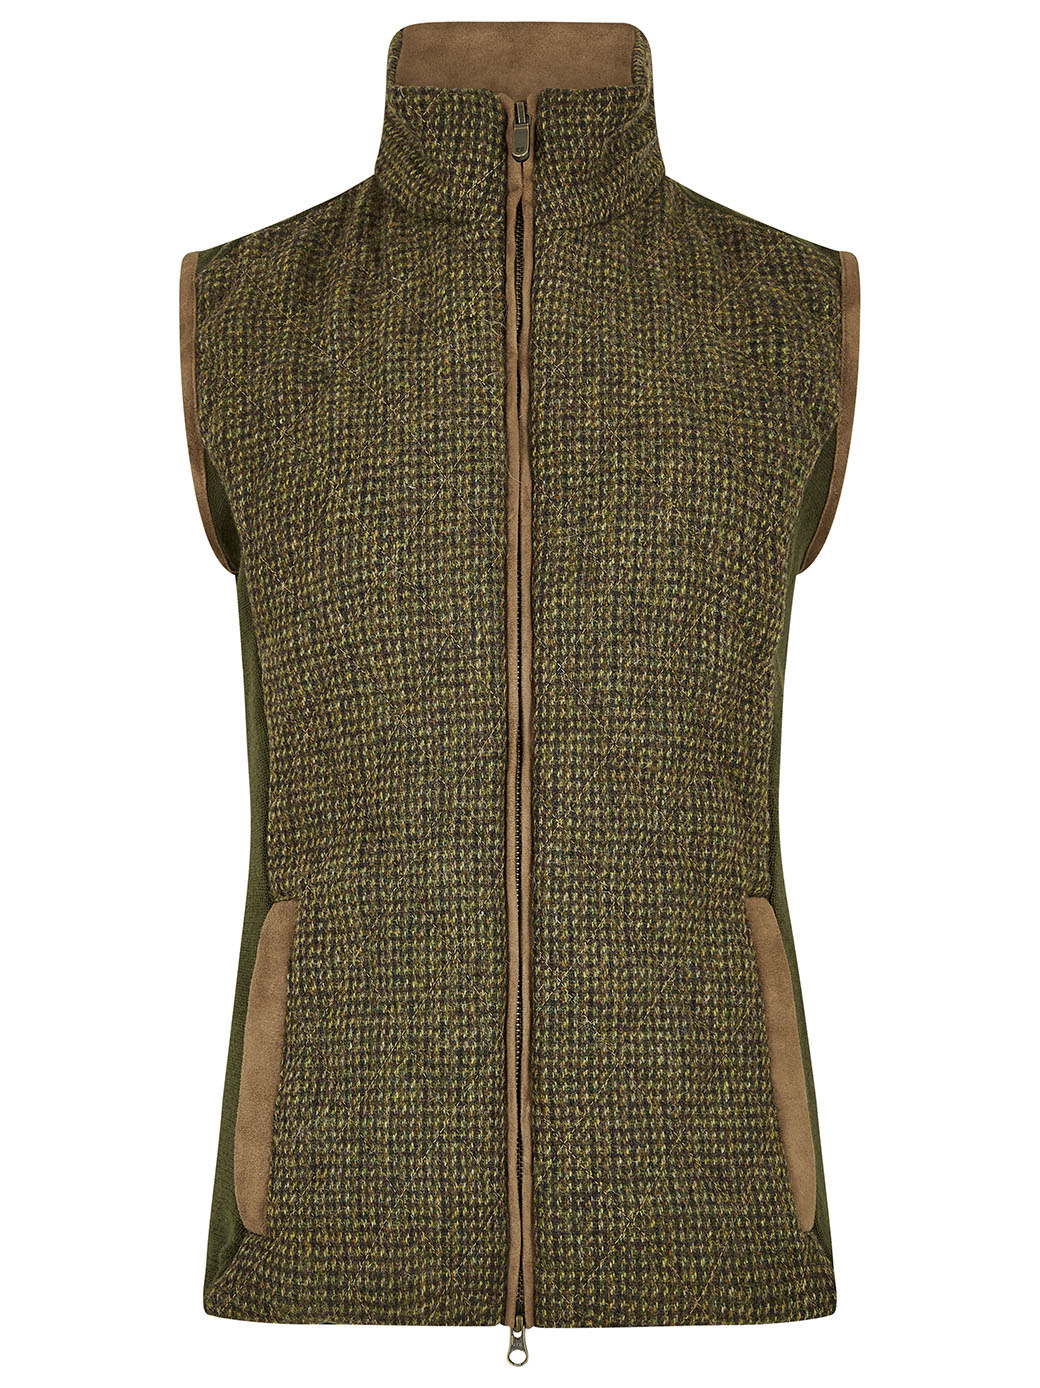 Dubarry Juniper Tweed Bodywarmer - Heath-1